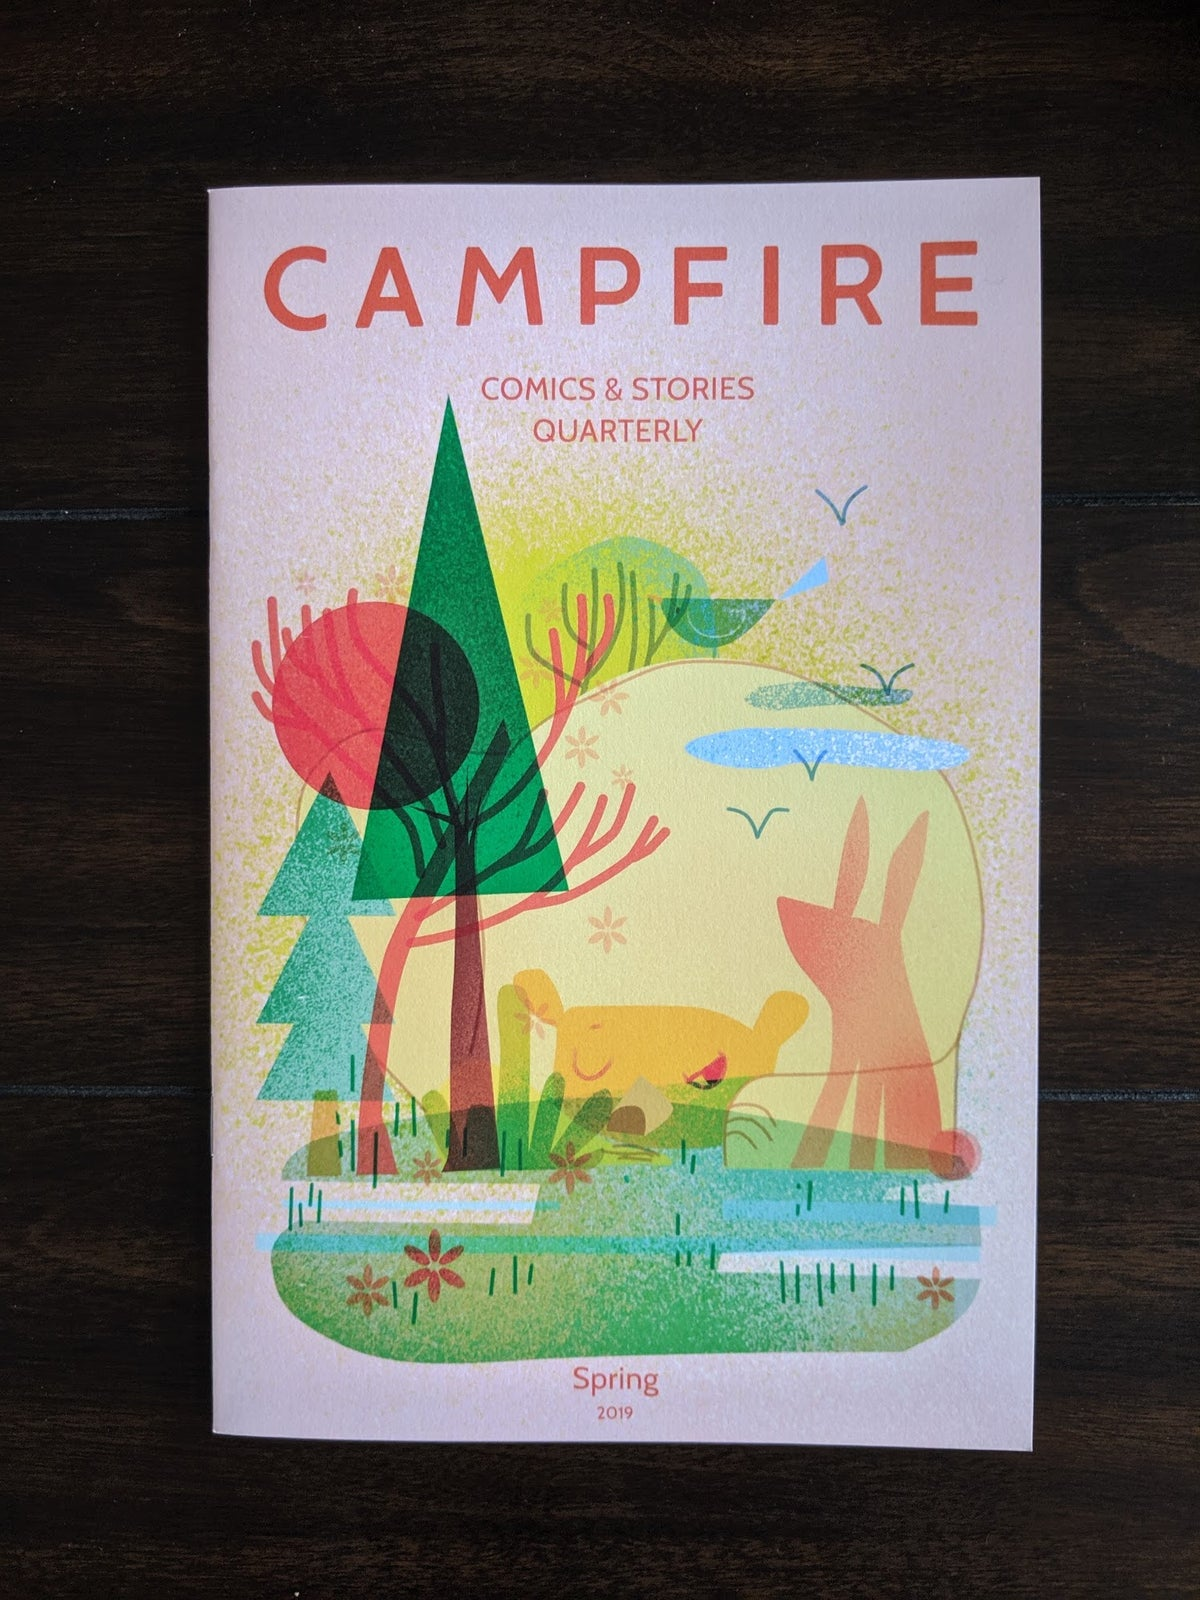 Image of Campfire Comics & Stories Quarterly Spring 2019